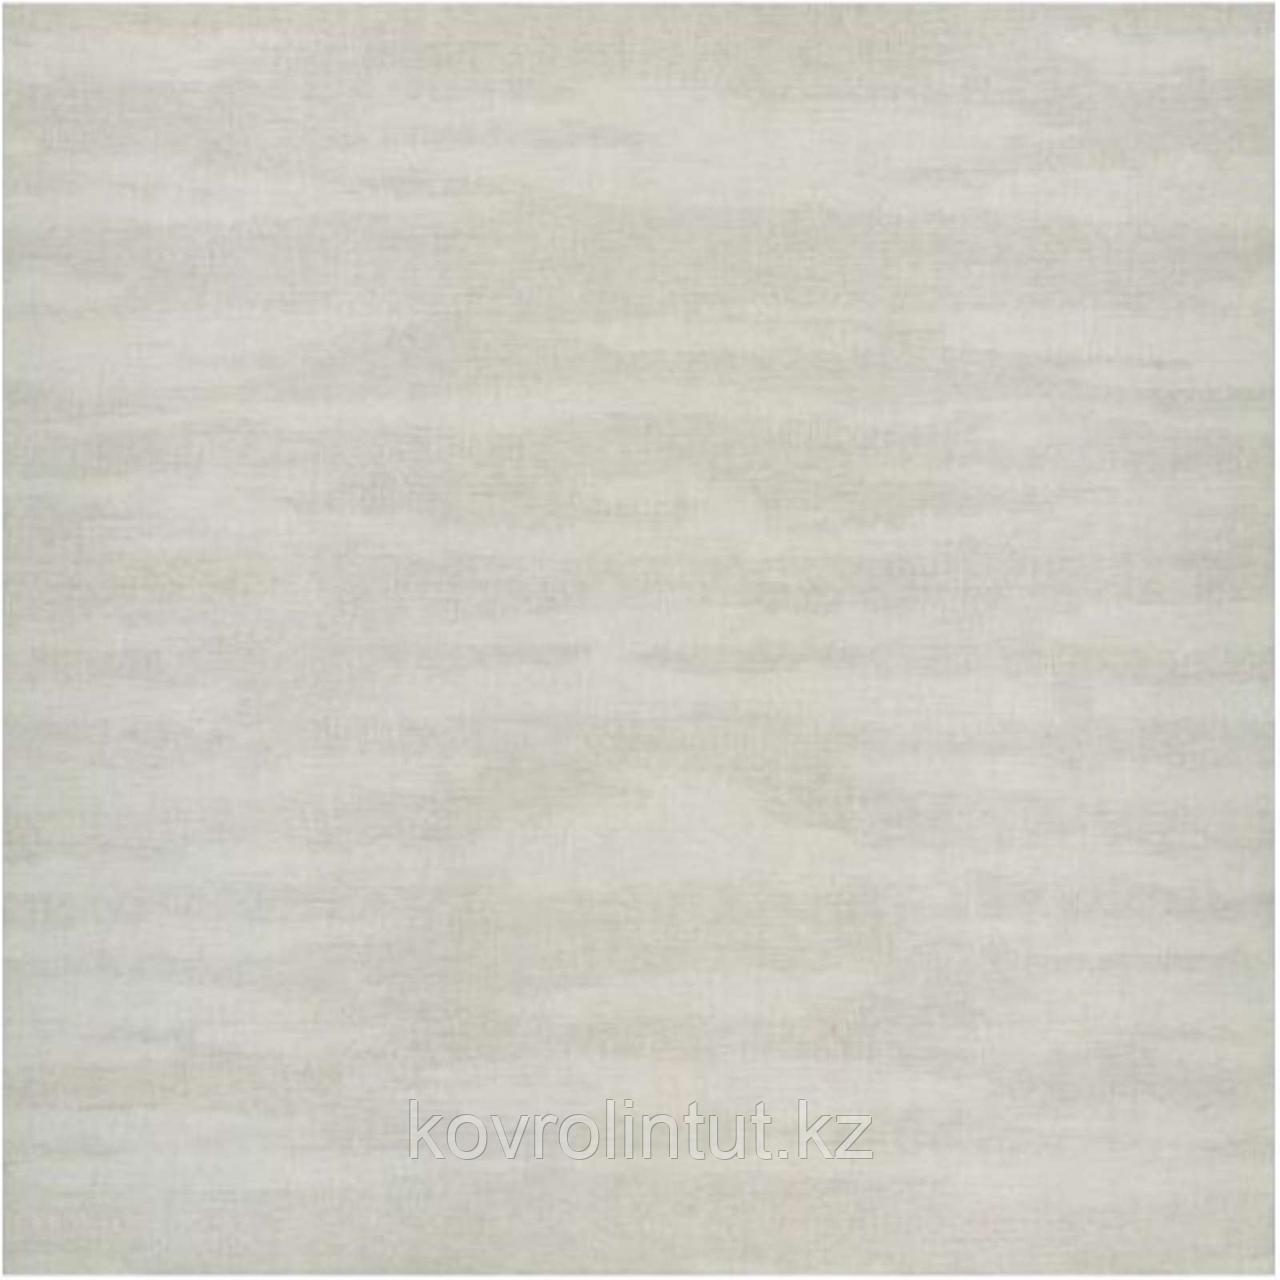 Плитка ПВХ клеевая Tarkett Art Vinyl Blues Essense 257014006